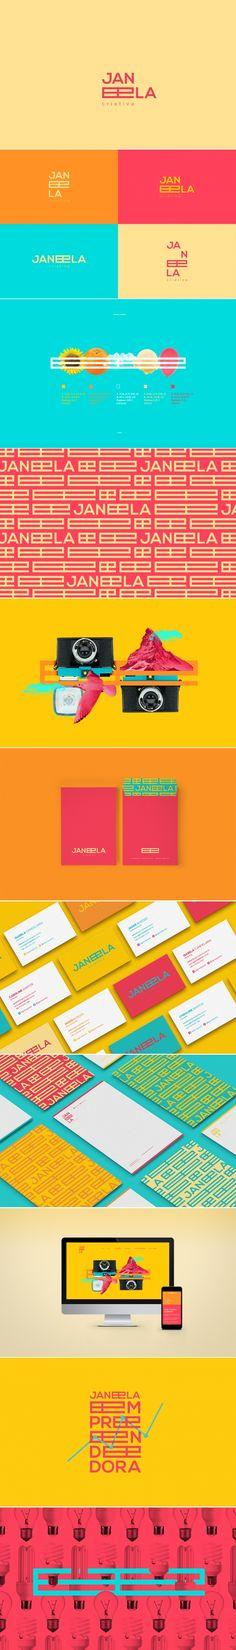 Janela Criativa Branding by Gustavo Kone | Fivestar Branding Agency – Design and Branding Agency & Curated Inspiration Gallery #branding #brand #artdirection #brandinginspiration #design #behance #pinterest #dribbble #fivestarbranding